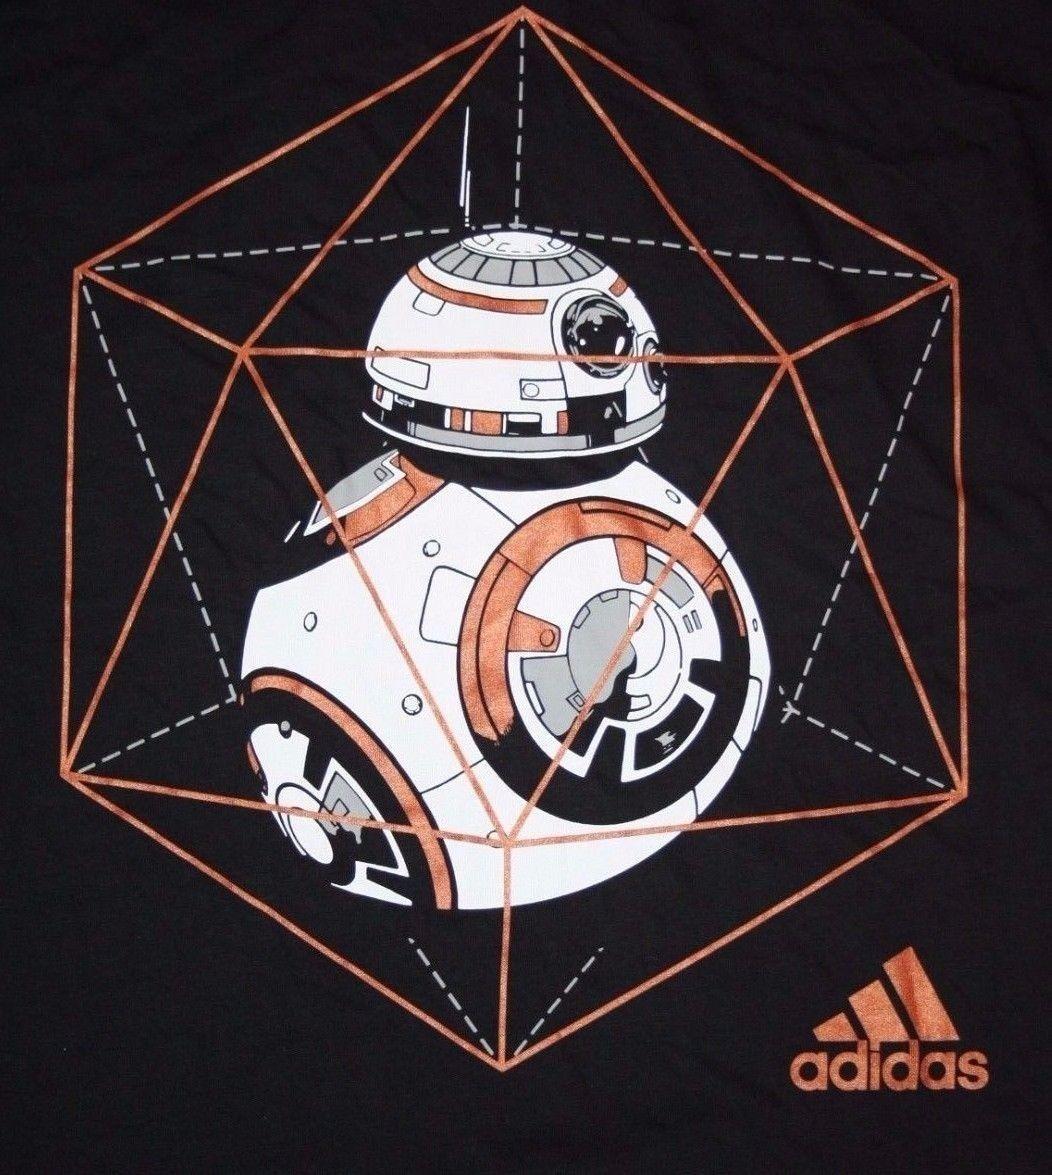 adidas Wars Camiseta Original Star Nueva xBeWQdroEC